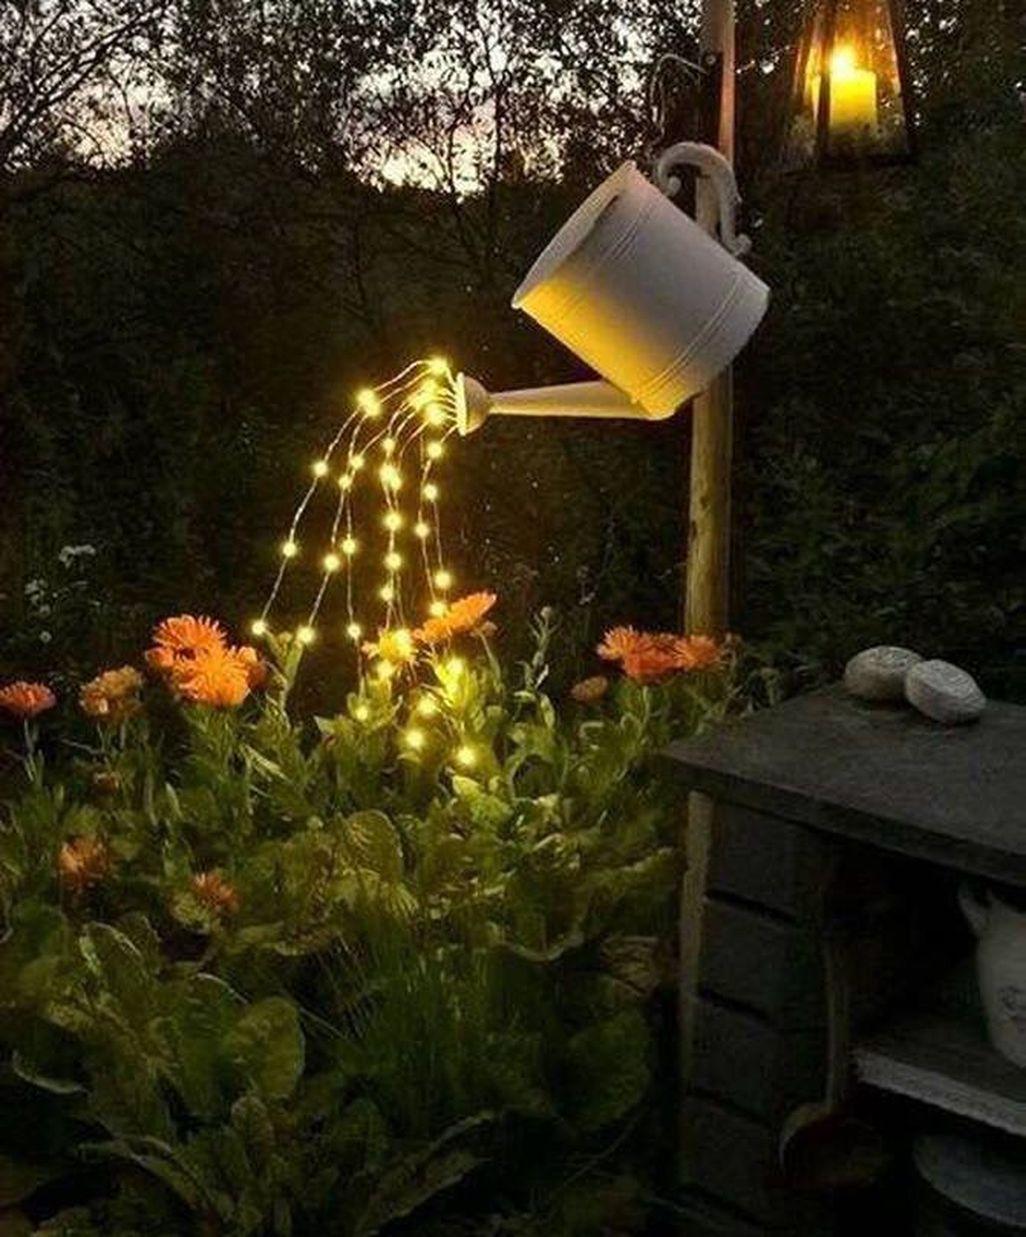 45 Fantastic Rustic Garden Light Landscaping Ideas Page 29 Of 47 Best Living Room In 2020 Rustic Garden Lighting Fairy Lights Diy Diy Waterfall